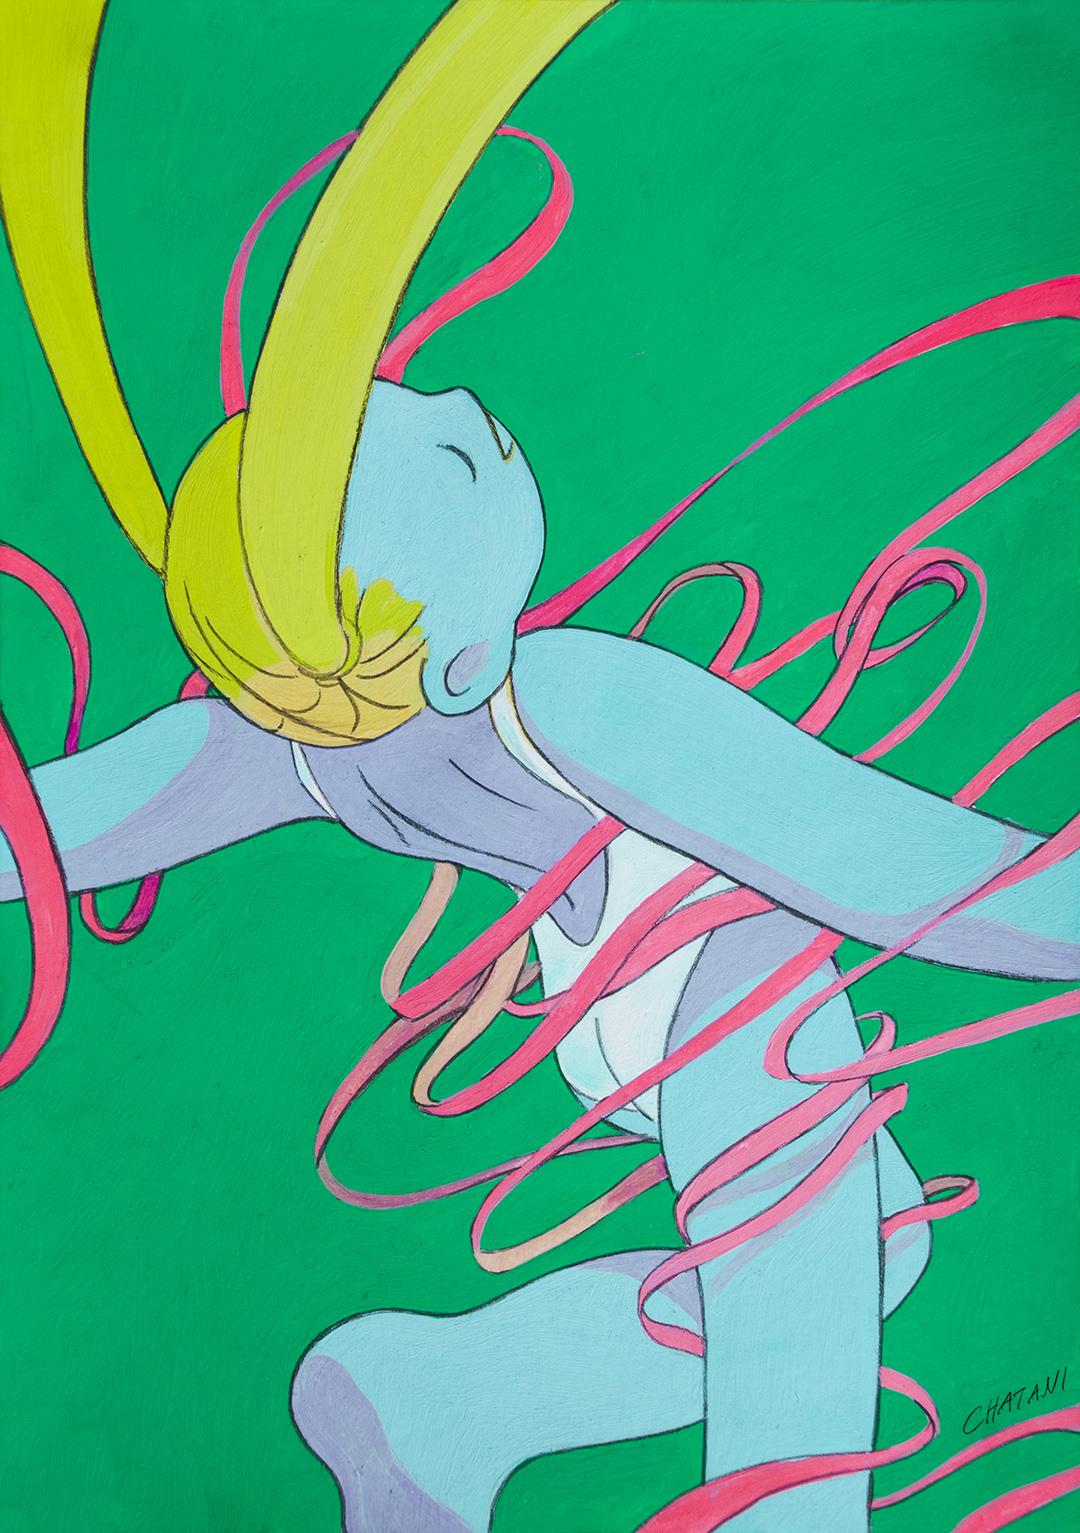 GirlsclubAsia-Artist-Hana Chatani-image 04